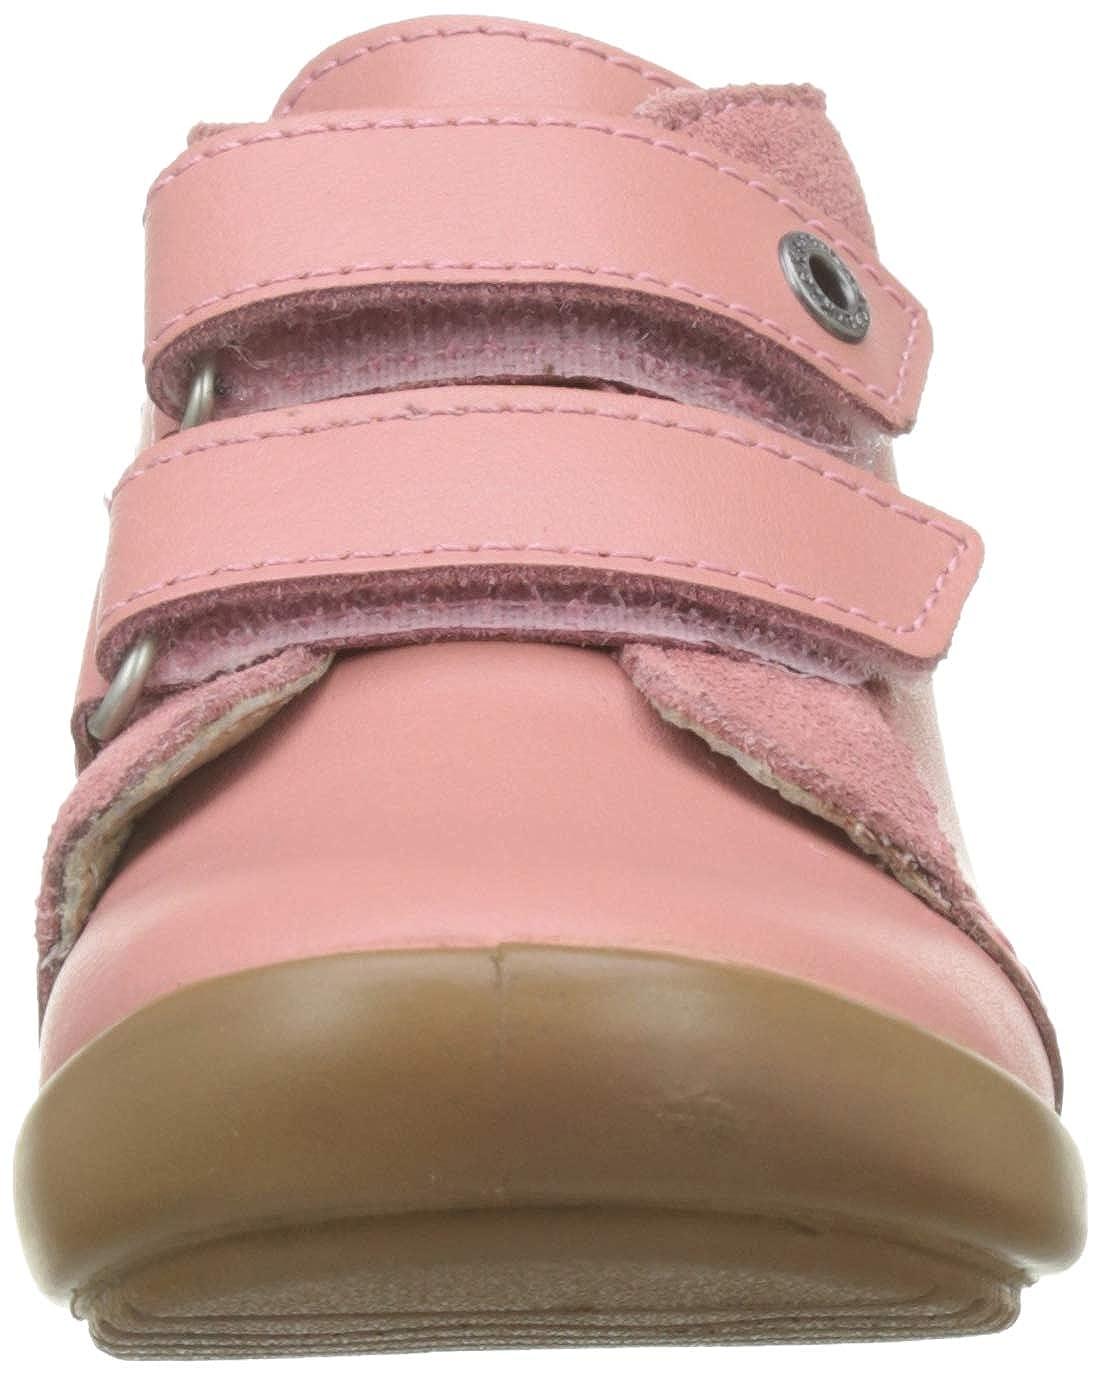 Kickers Unisex Babies/' Kinew Boots